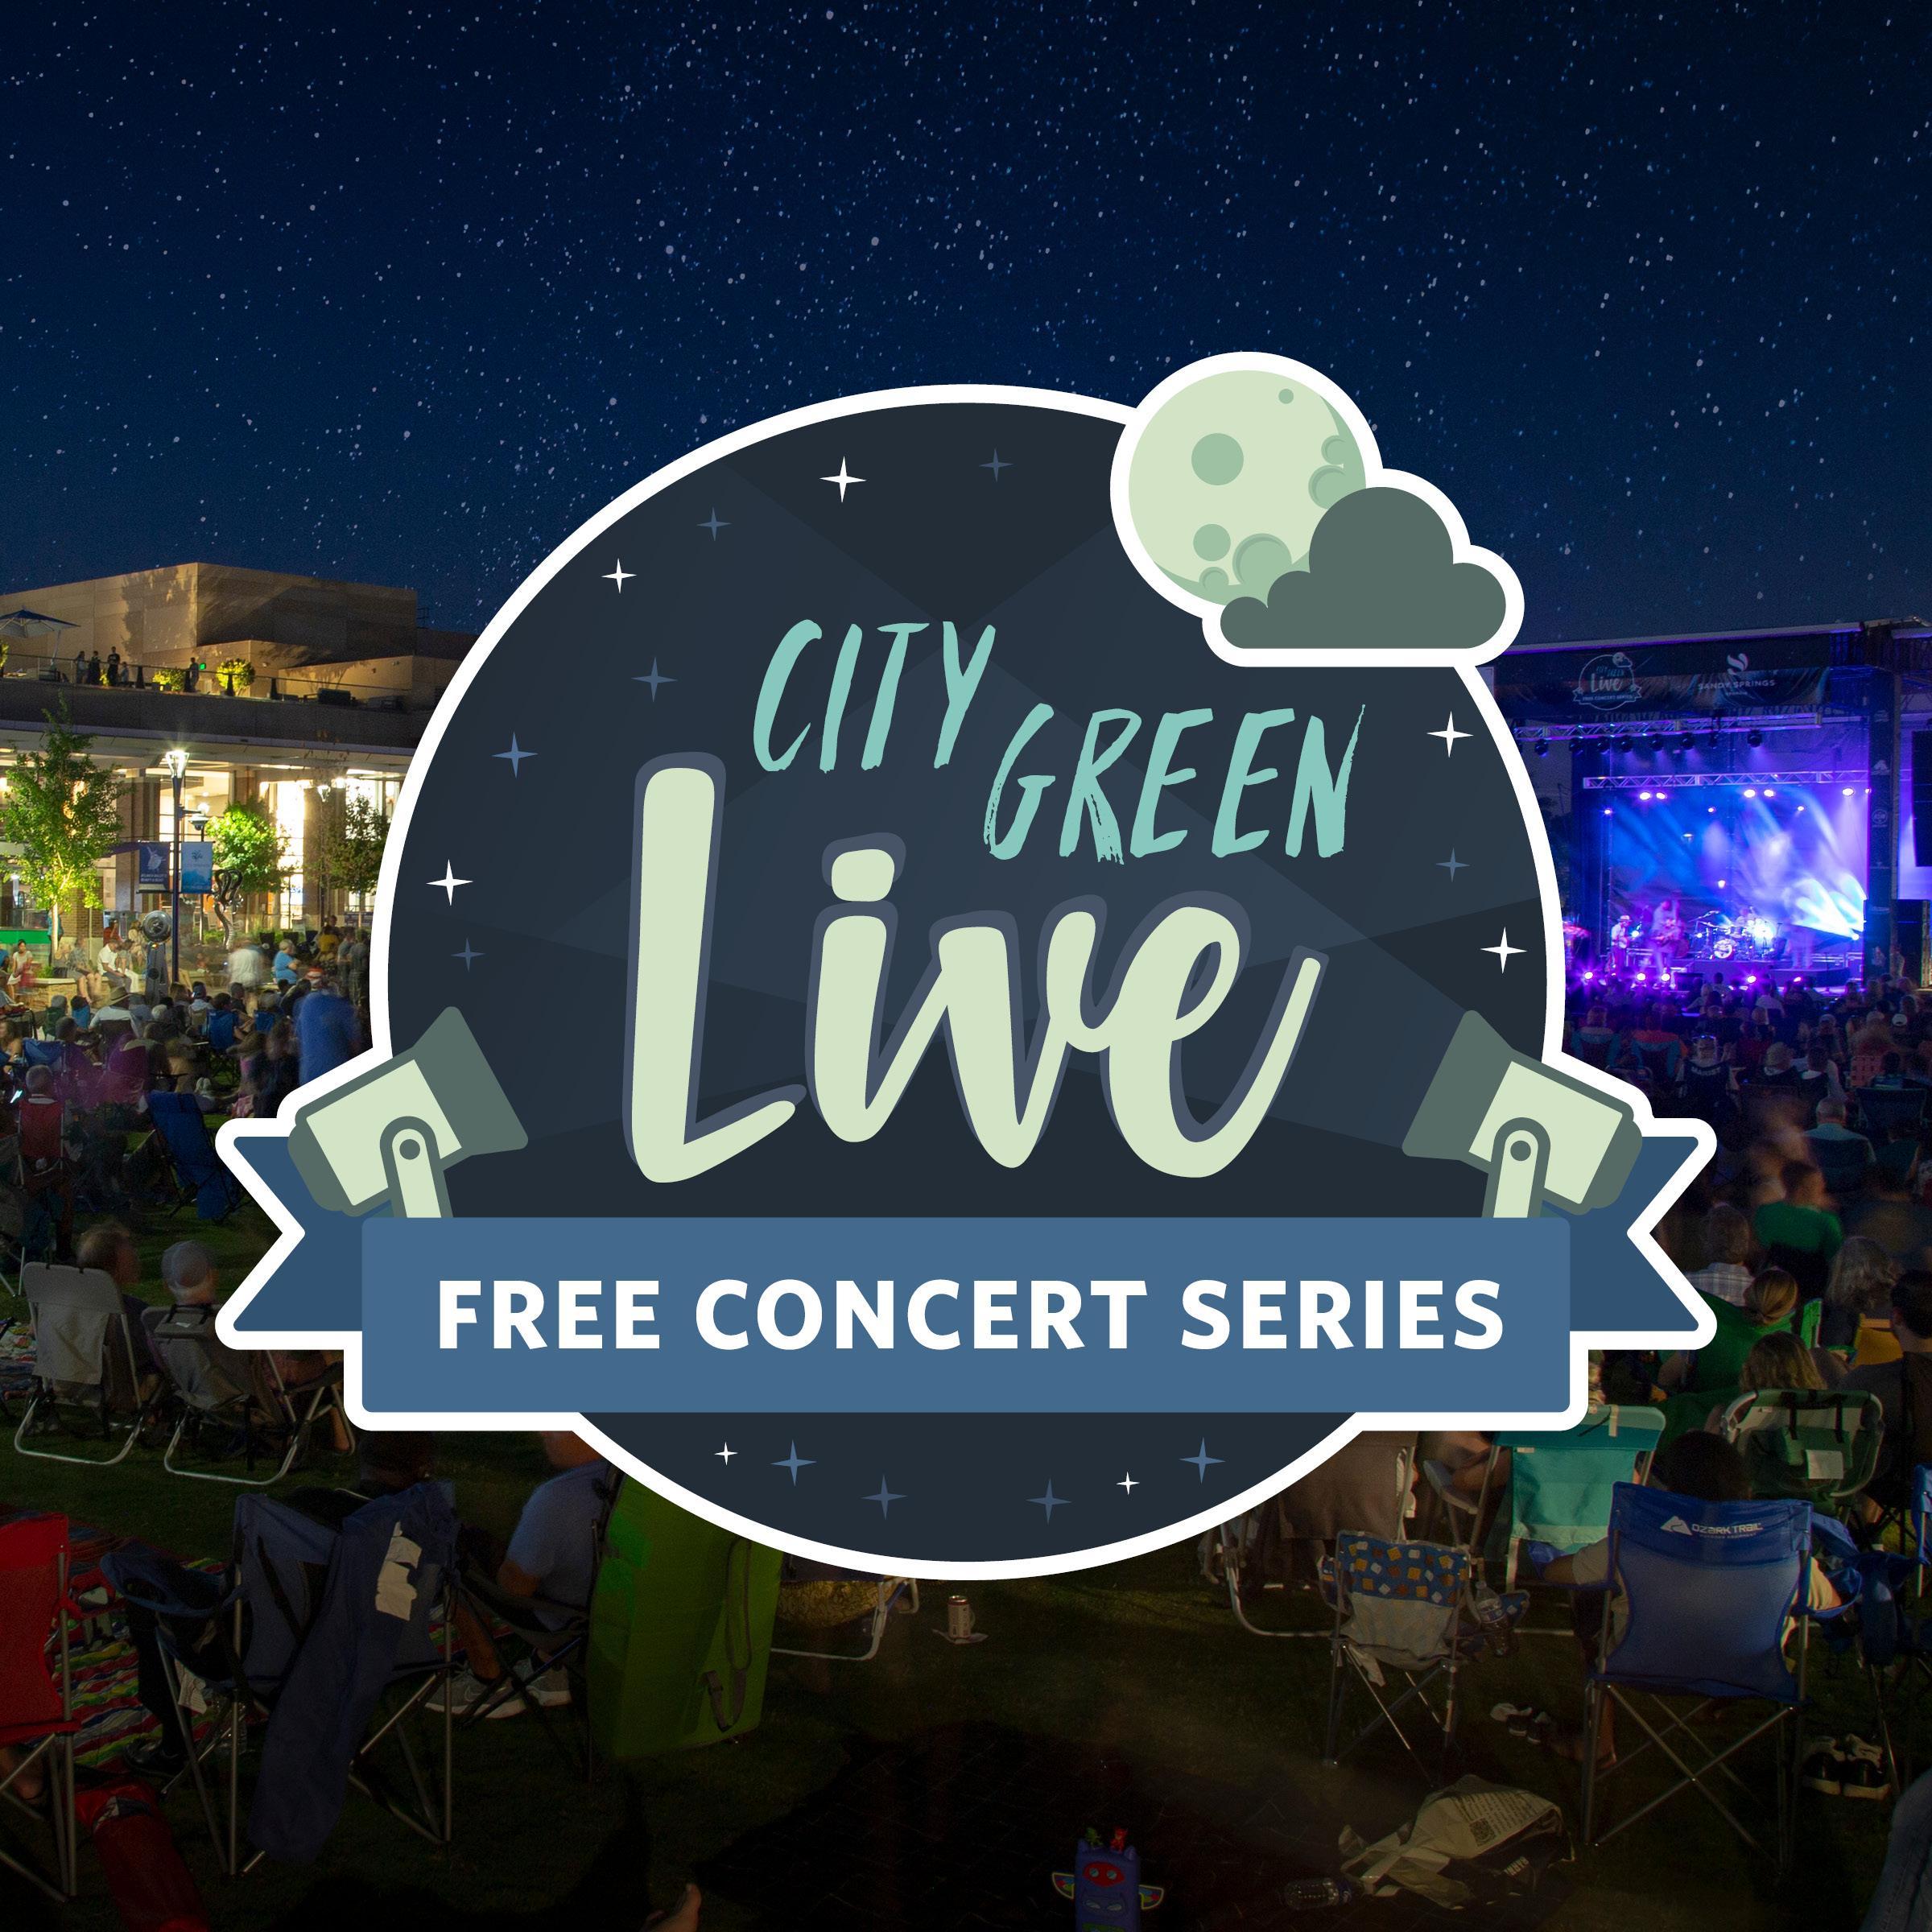 City Green Live - Uptown Funk